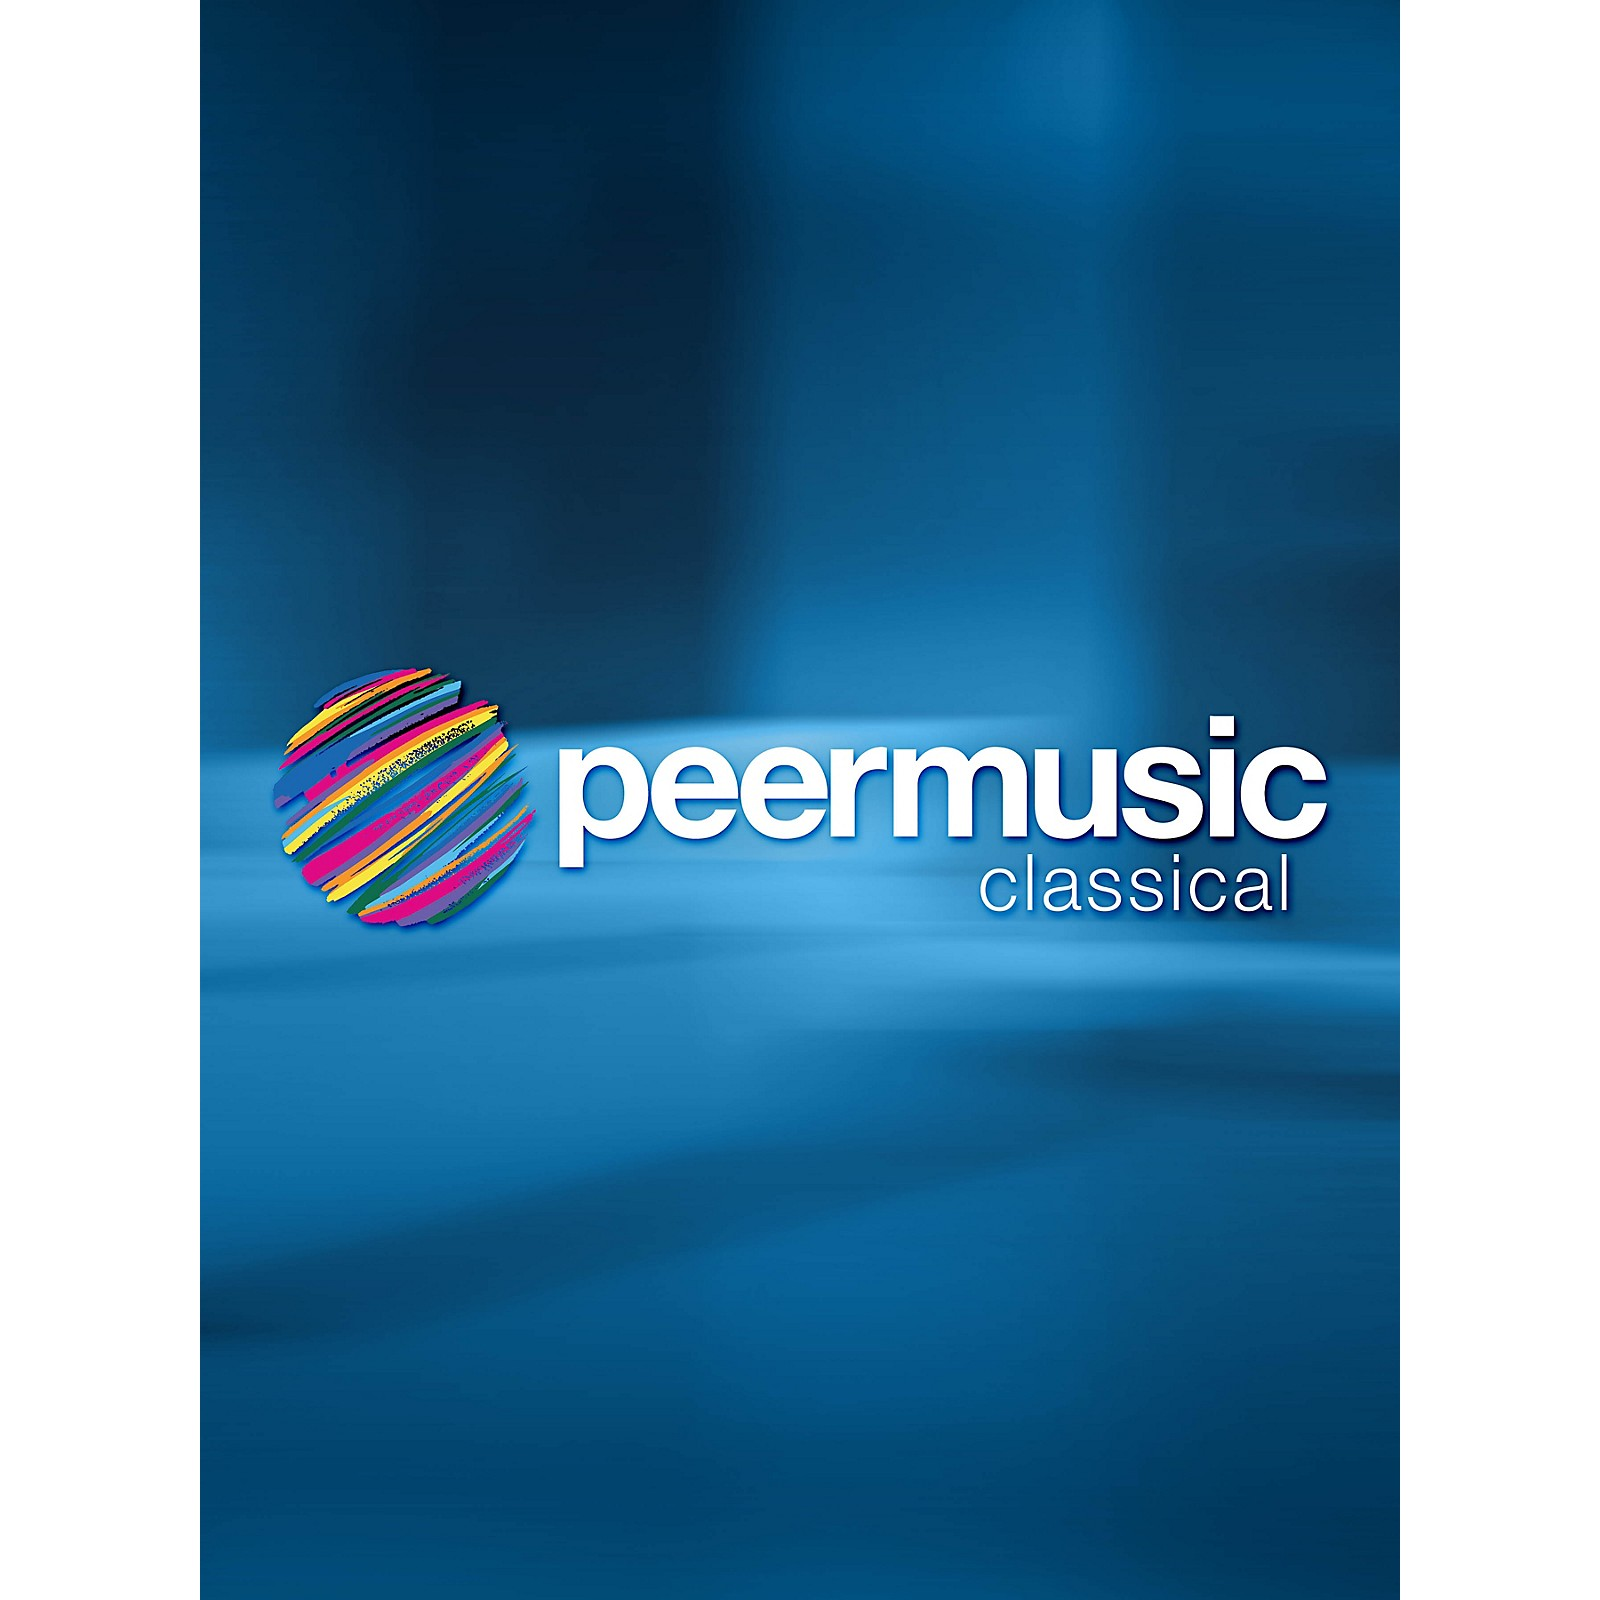 Peer Music Sonatina Ritmica (Piano Solo) Peermusic Classical Series Softcover